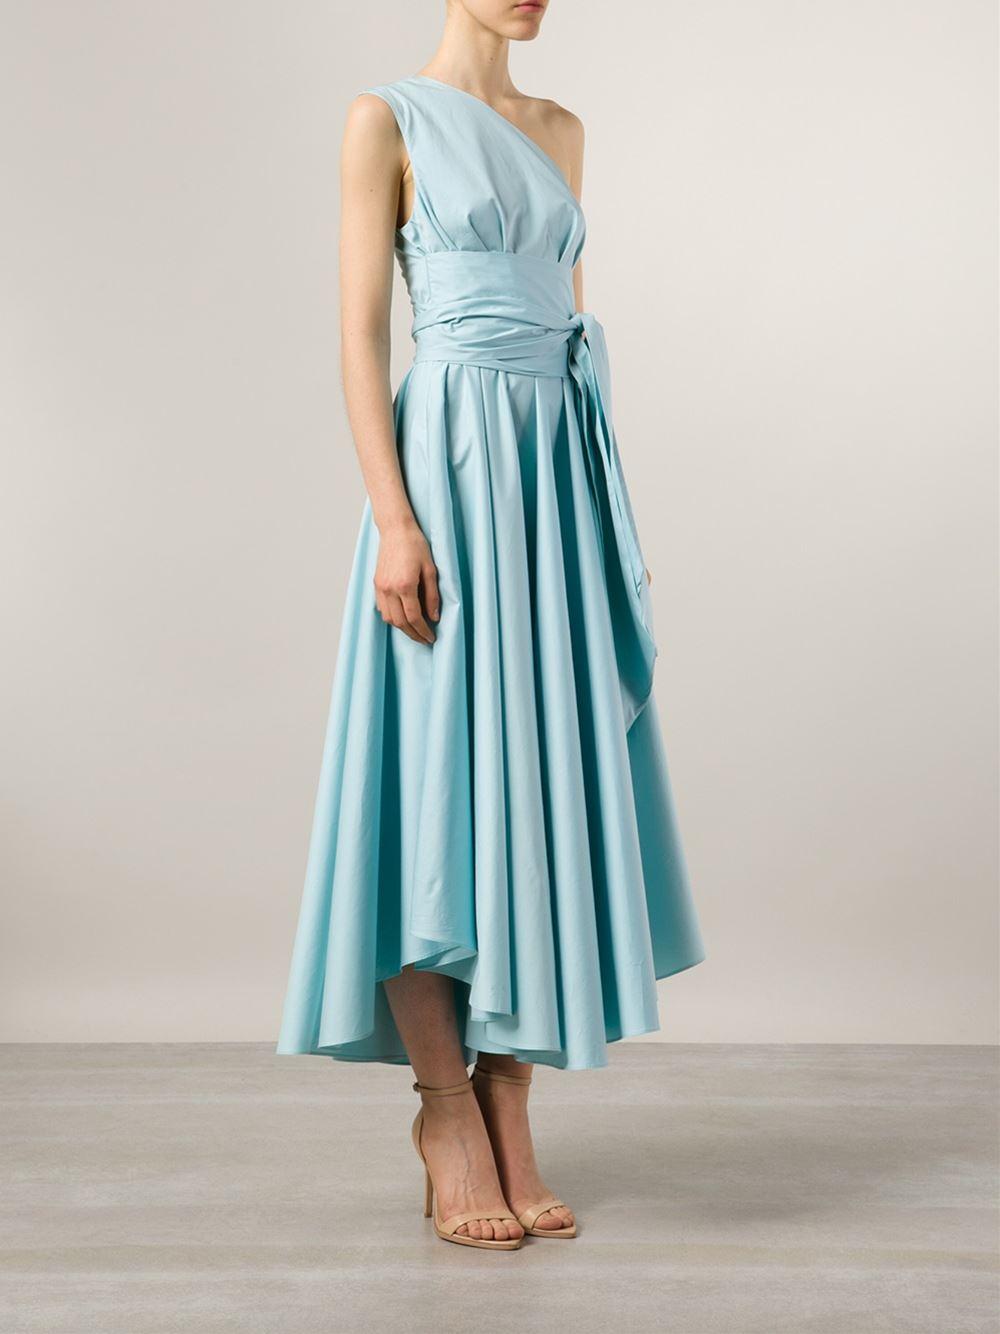 Tibi One Shoulder Flared Dress in Blue | Lyst